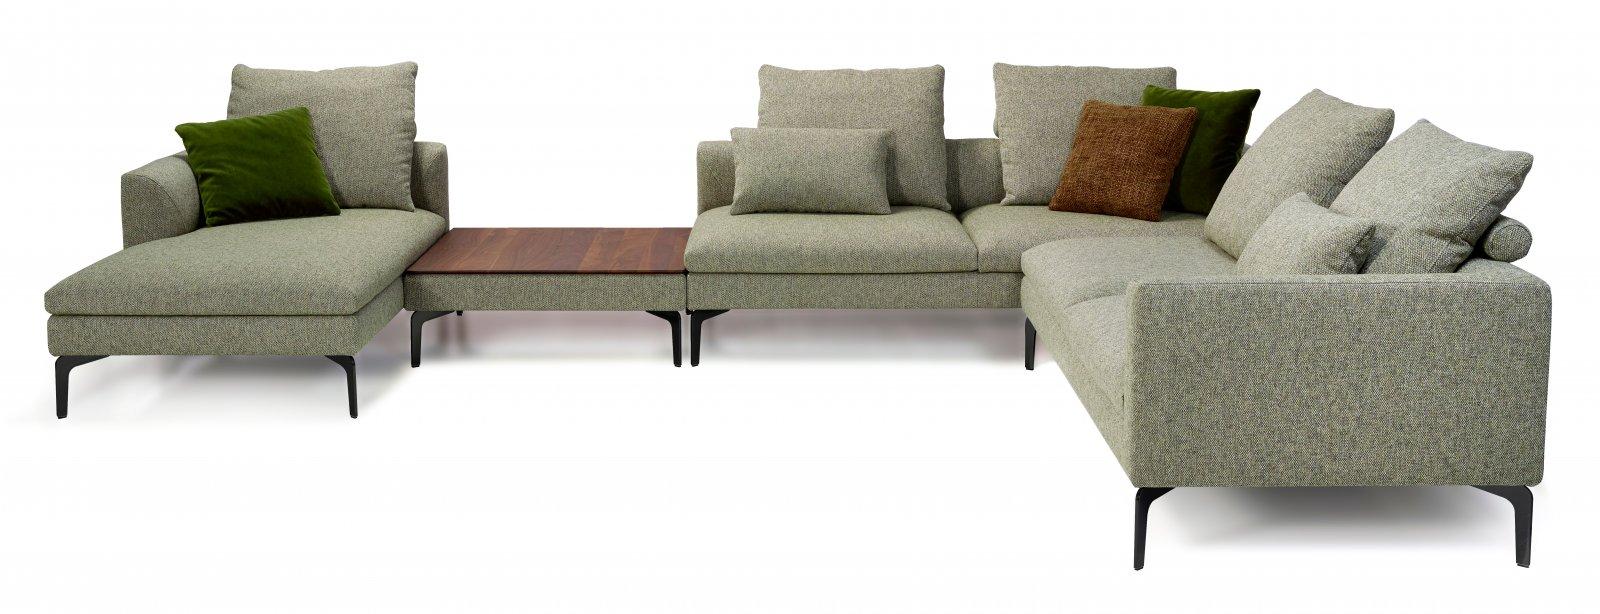 2018Jori Del Mobile Flexible Seating Comfort Salone Combines And tQrshd